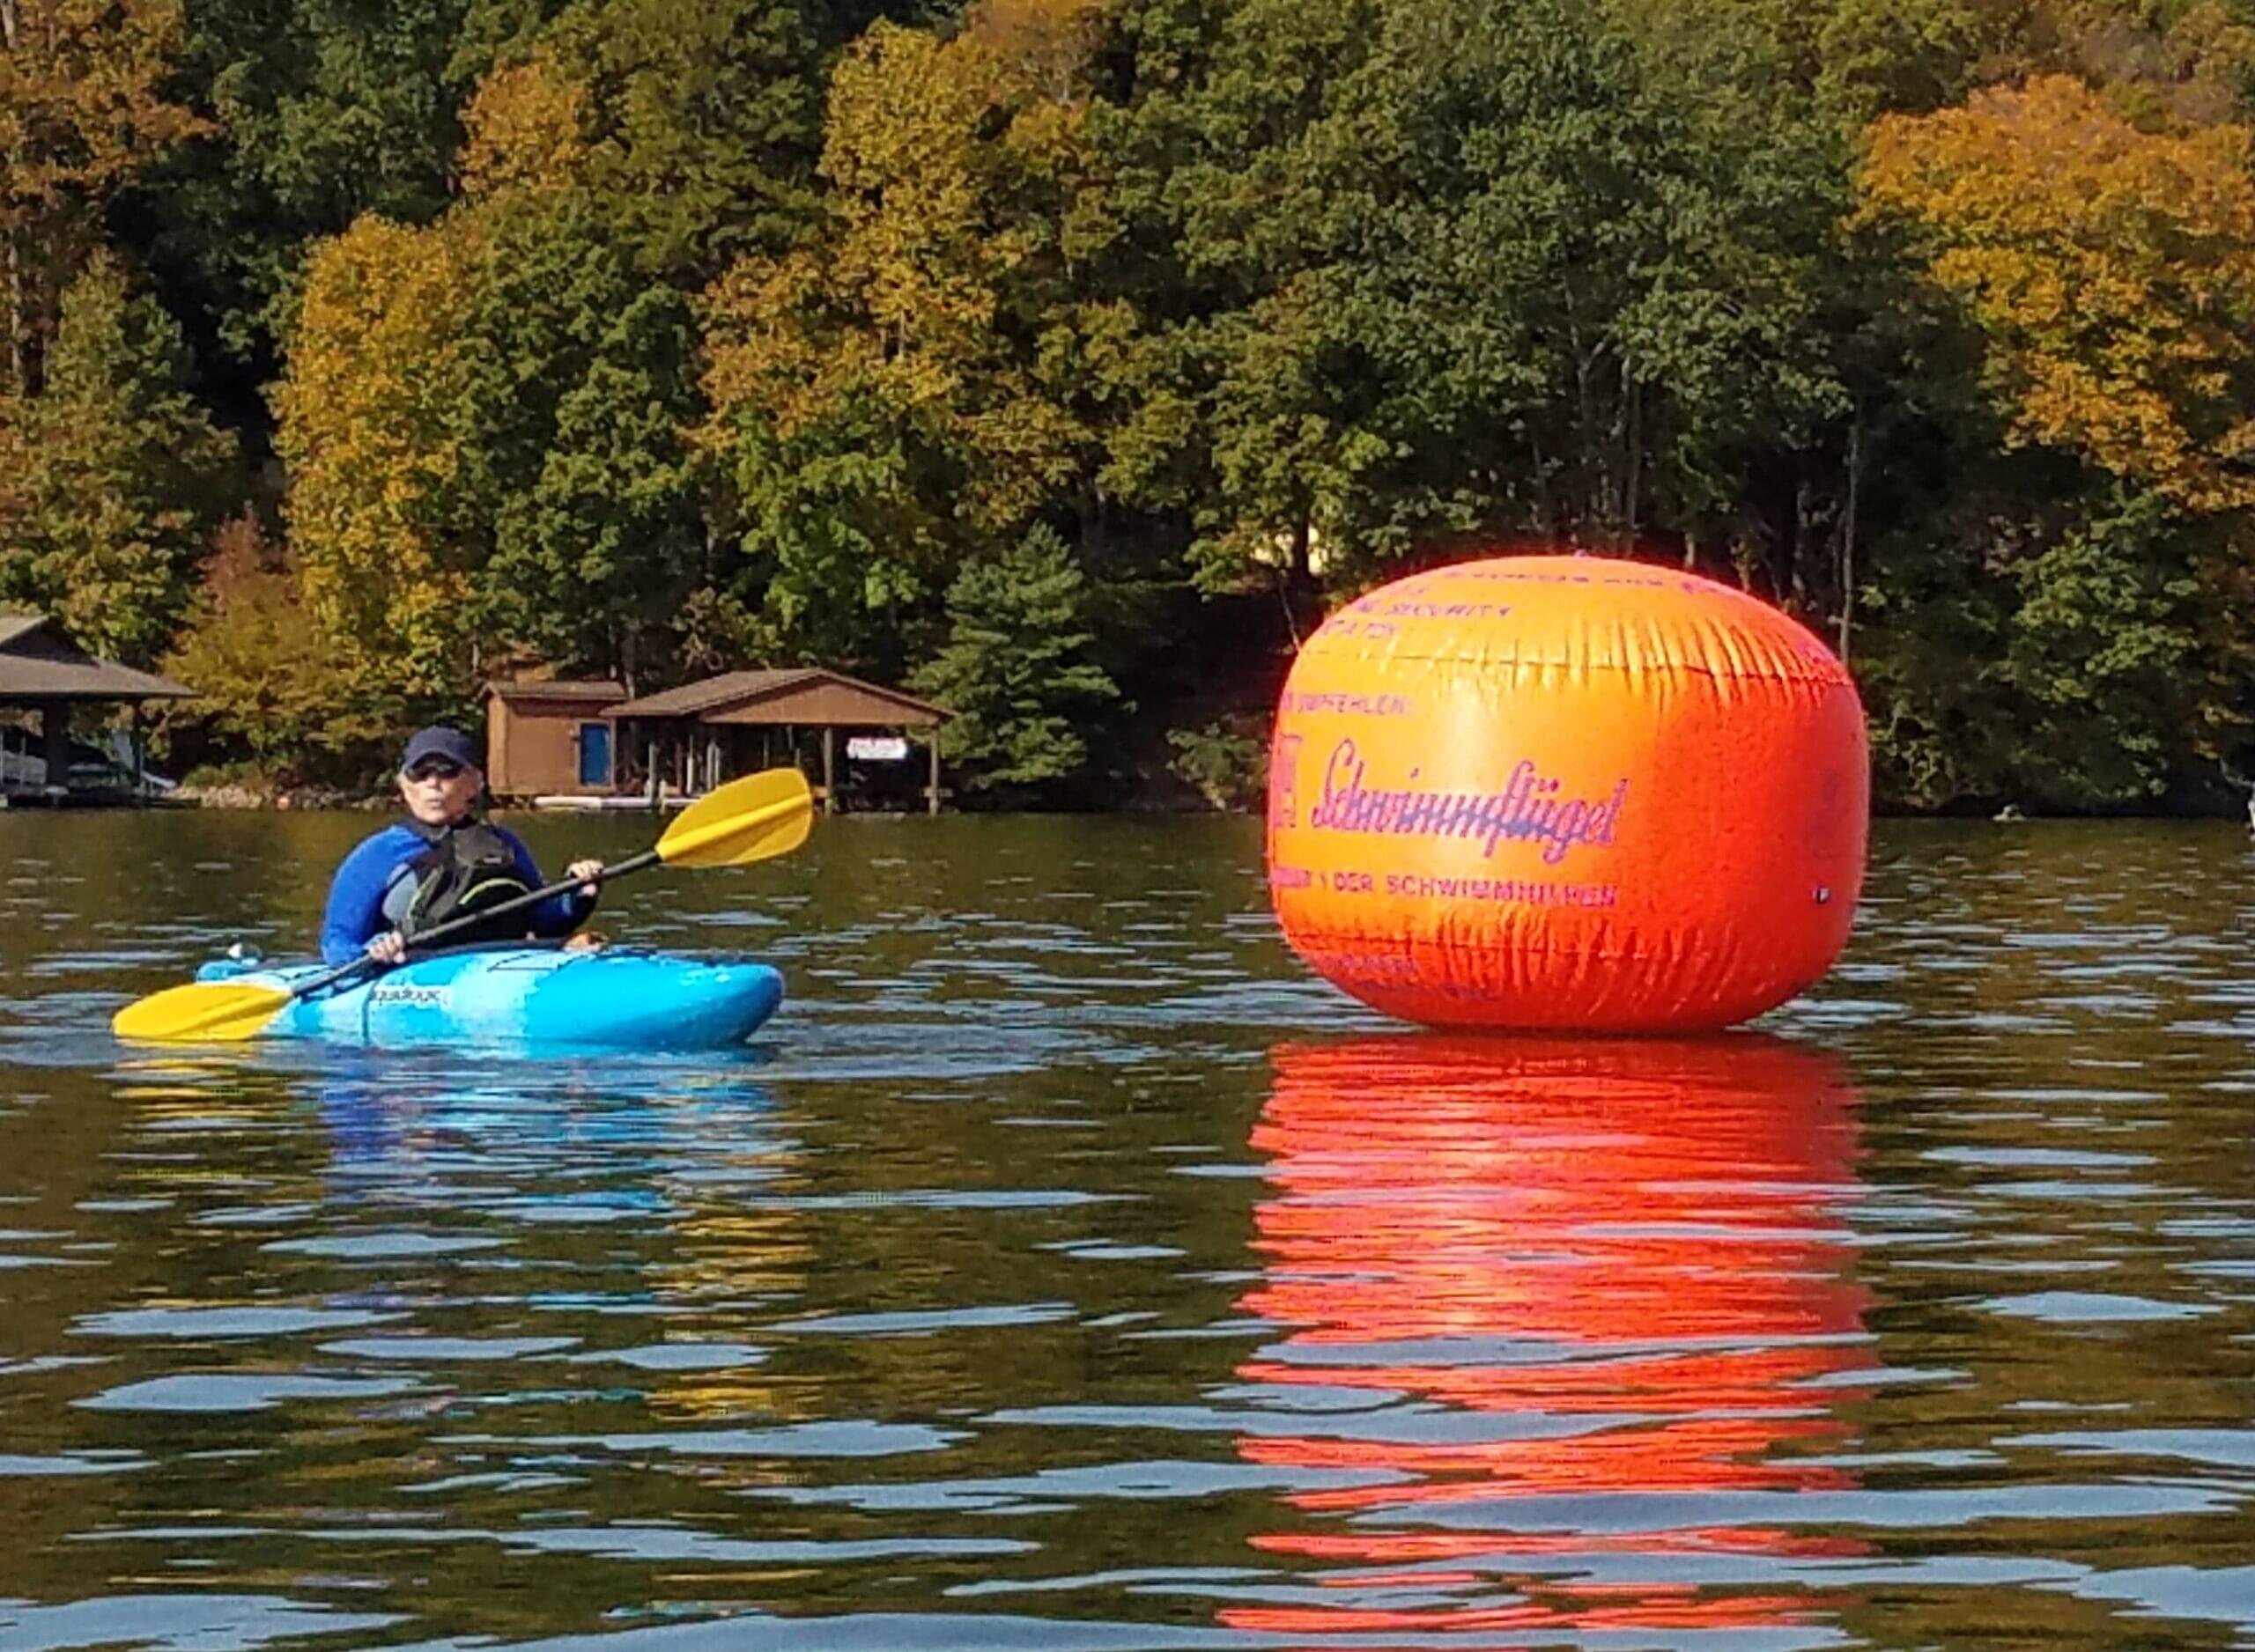 kayaker-and-orange-round-float